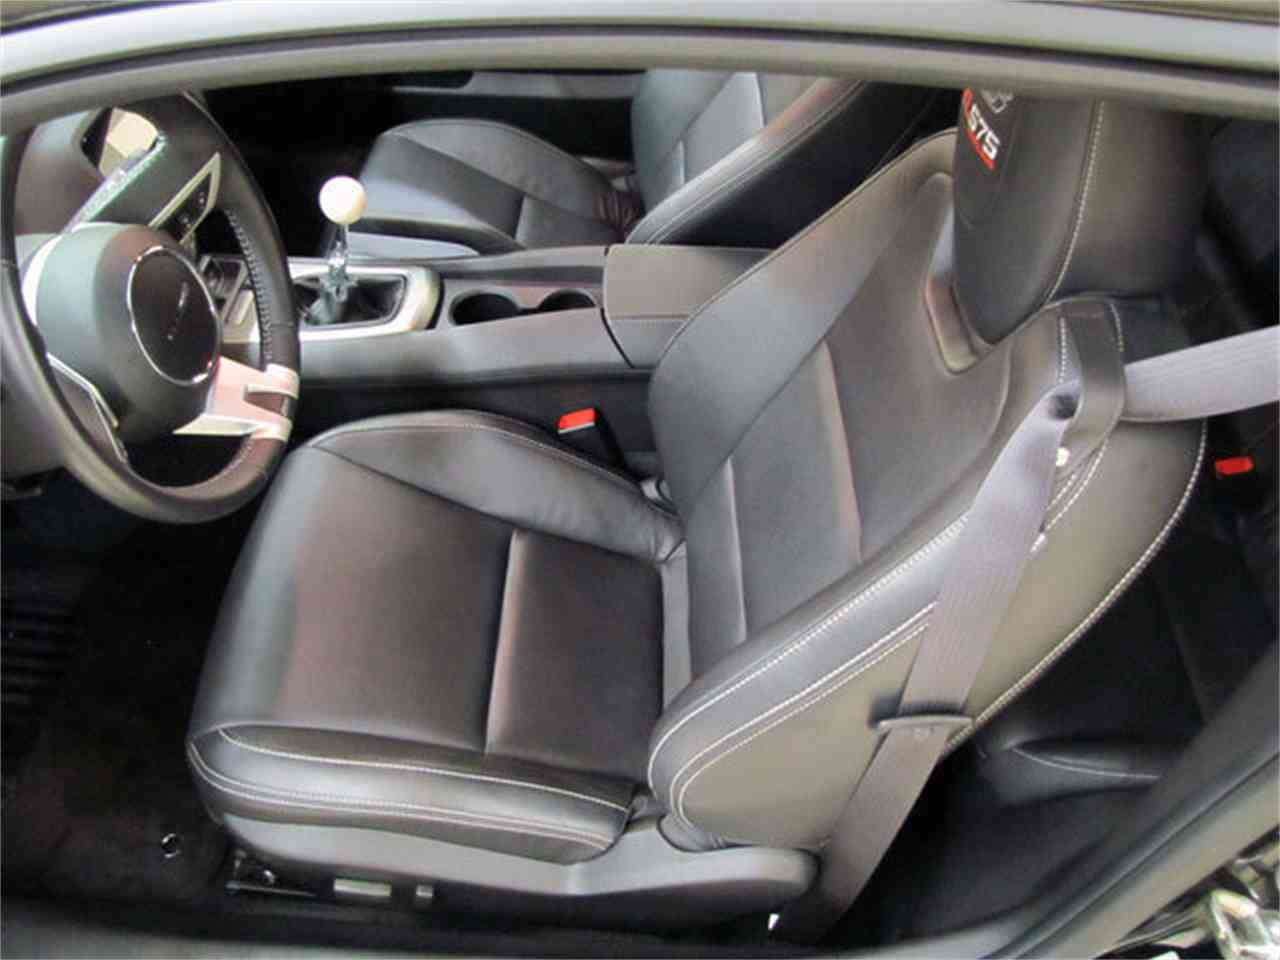 2010 Chevrolet Camaro Slp Zl 575 For Sale Classiccars